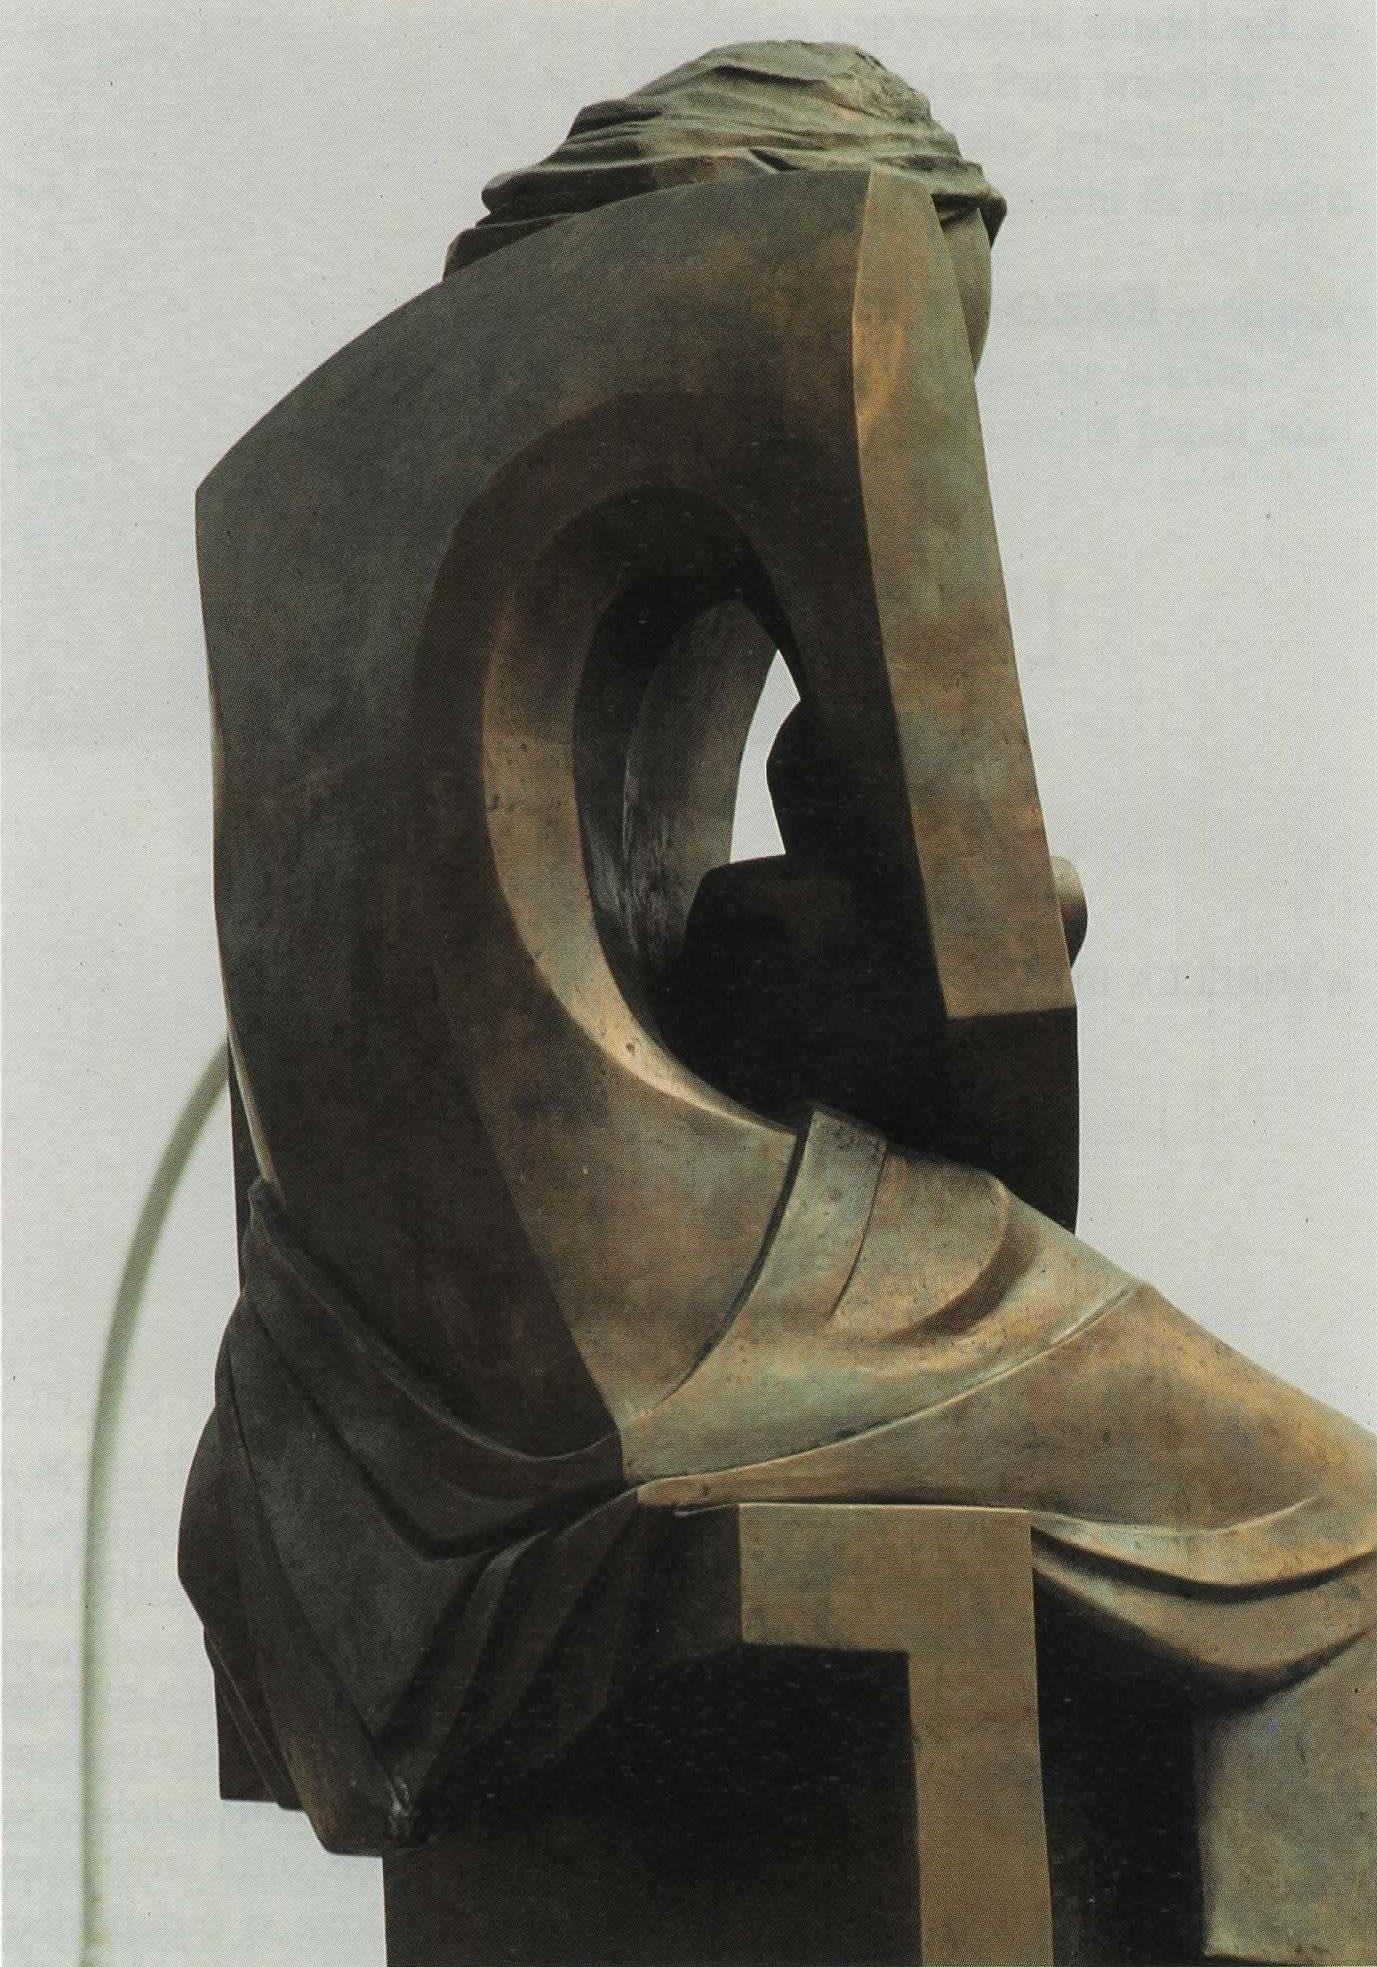 Filippo Scimeca - Mater semper